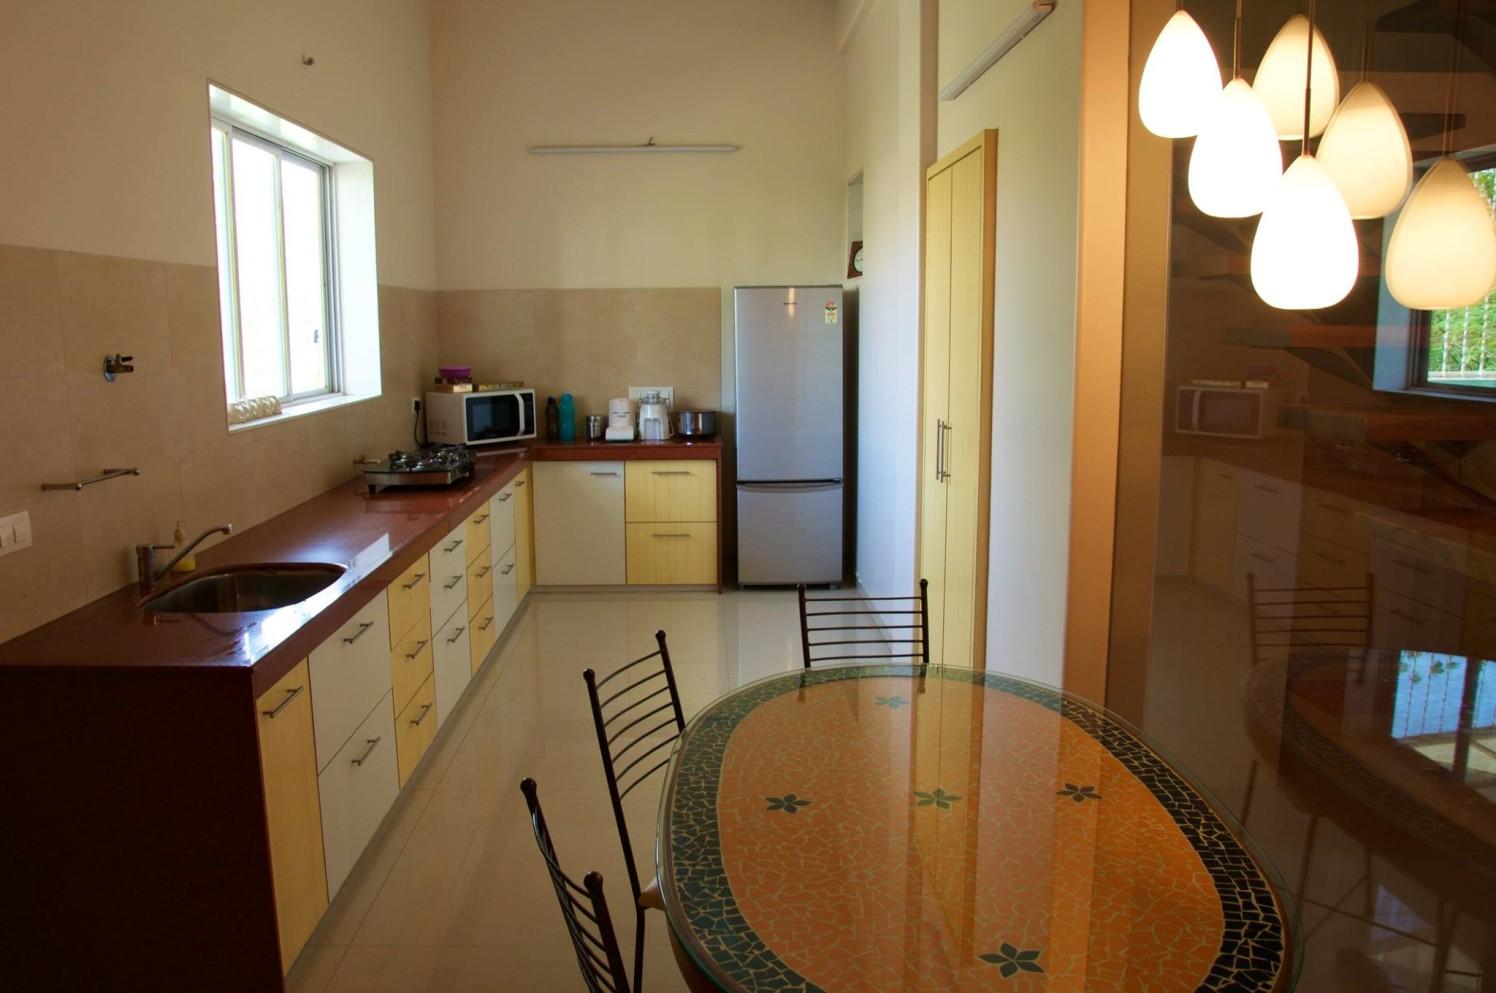 Modular Kitchen by Design Kkarma Modular-kitchen Minimalistic   Interior Design Photos & Ideas